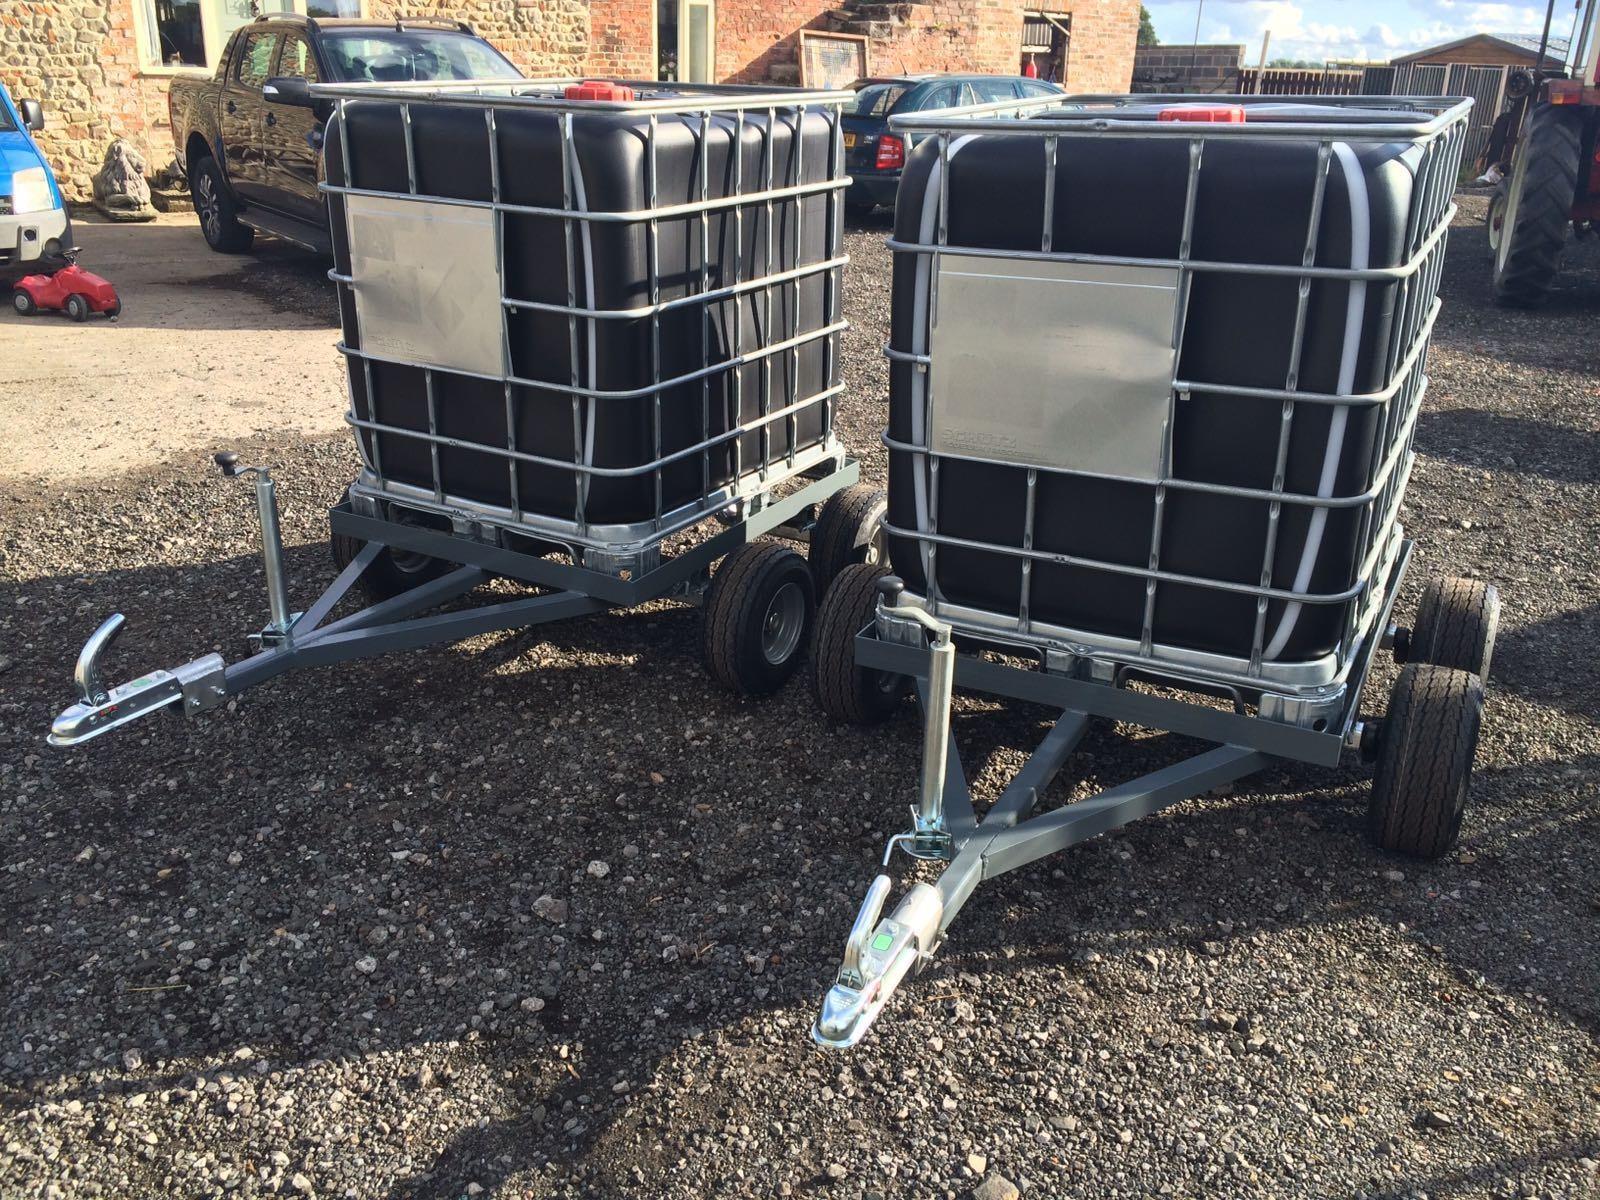 QUAD  TRAILER AXLE WATER BOWSER IBC TRANSPORT, SHEEP LAMA COWS  tractors ATV